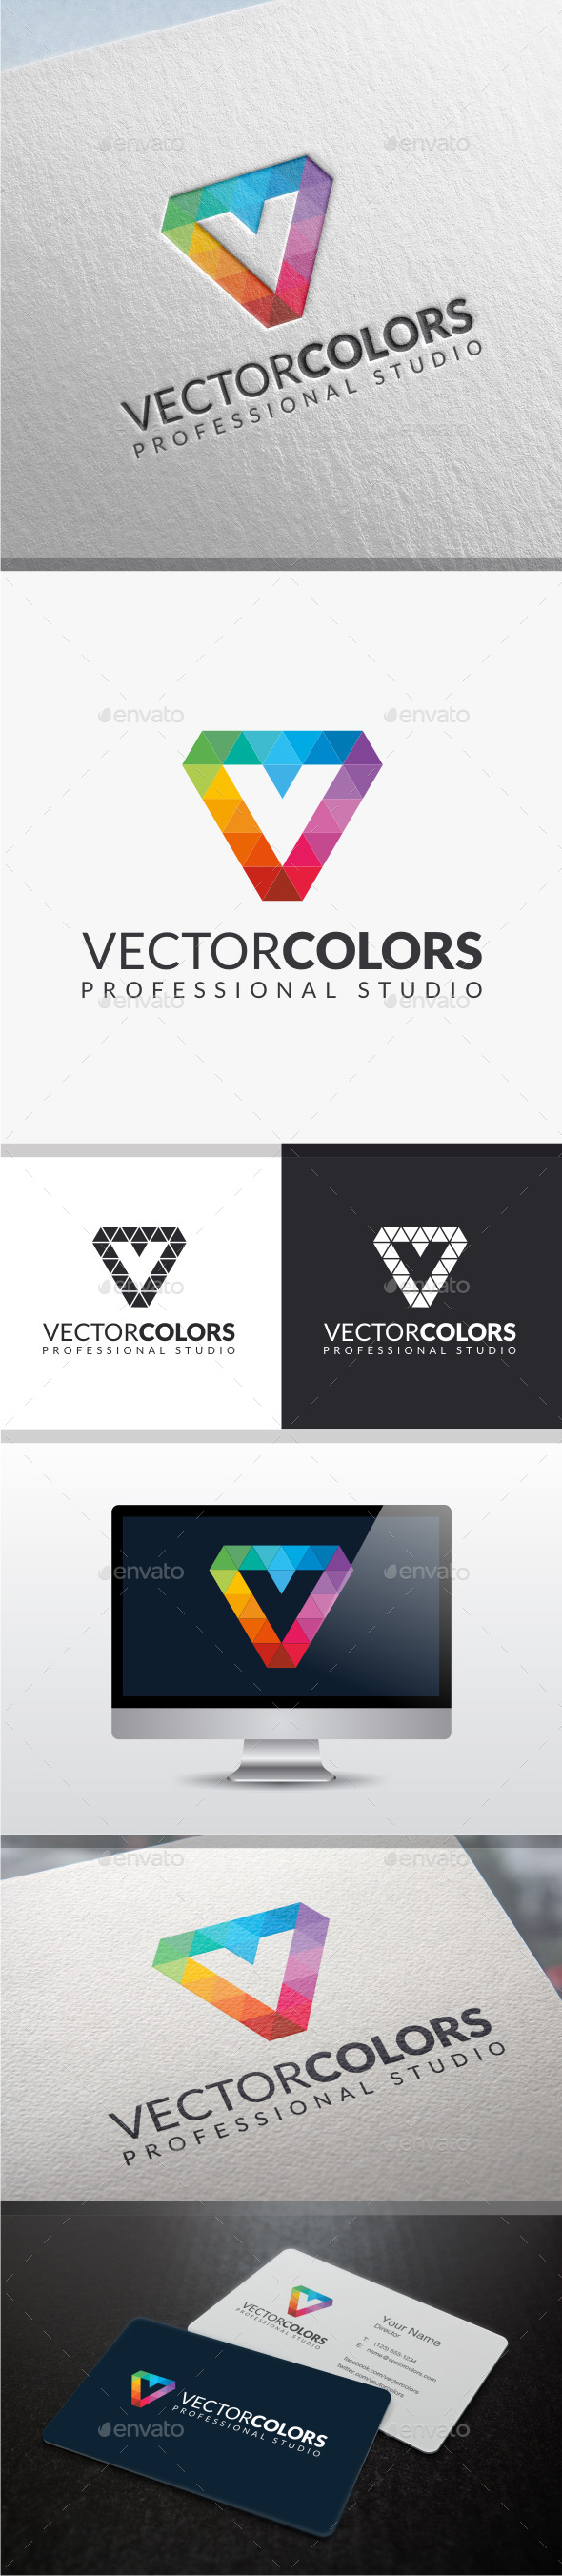 Vector Colors - Letter V Logo  - Letters Logo Templates